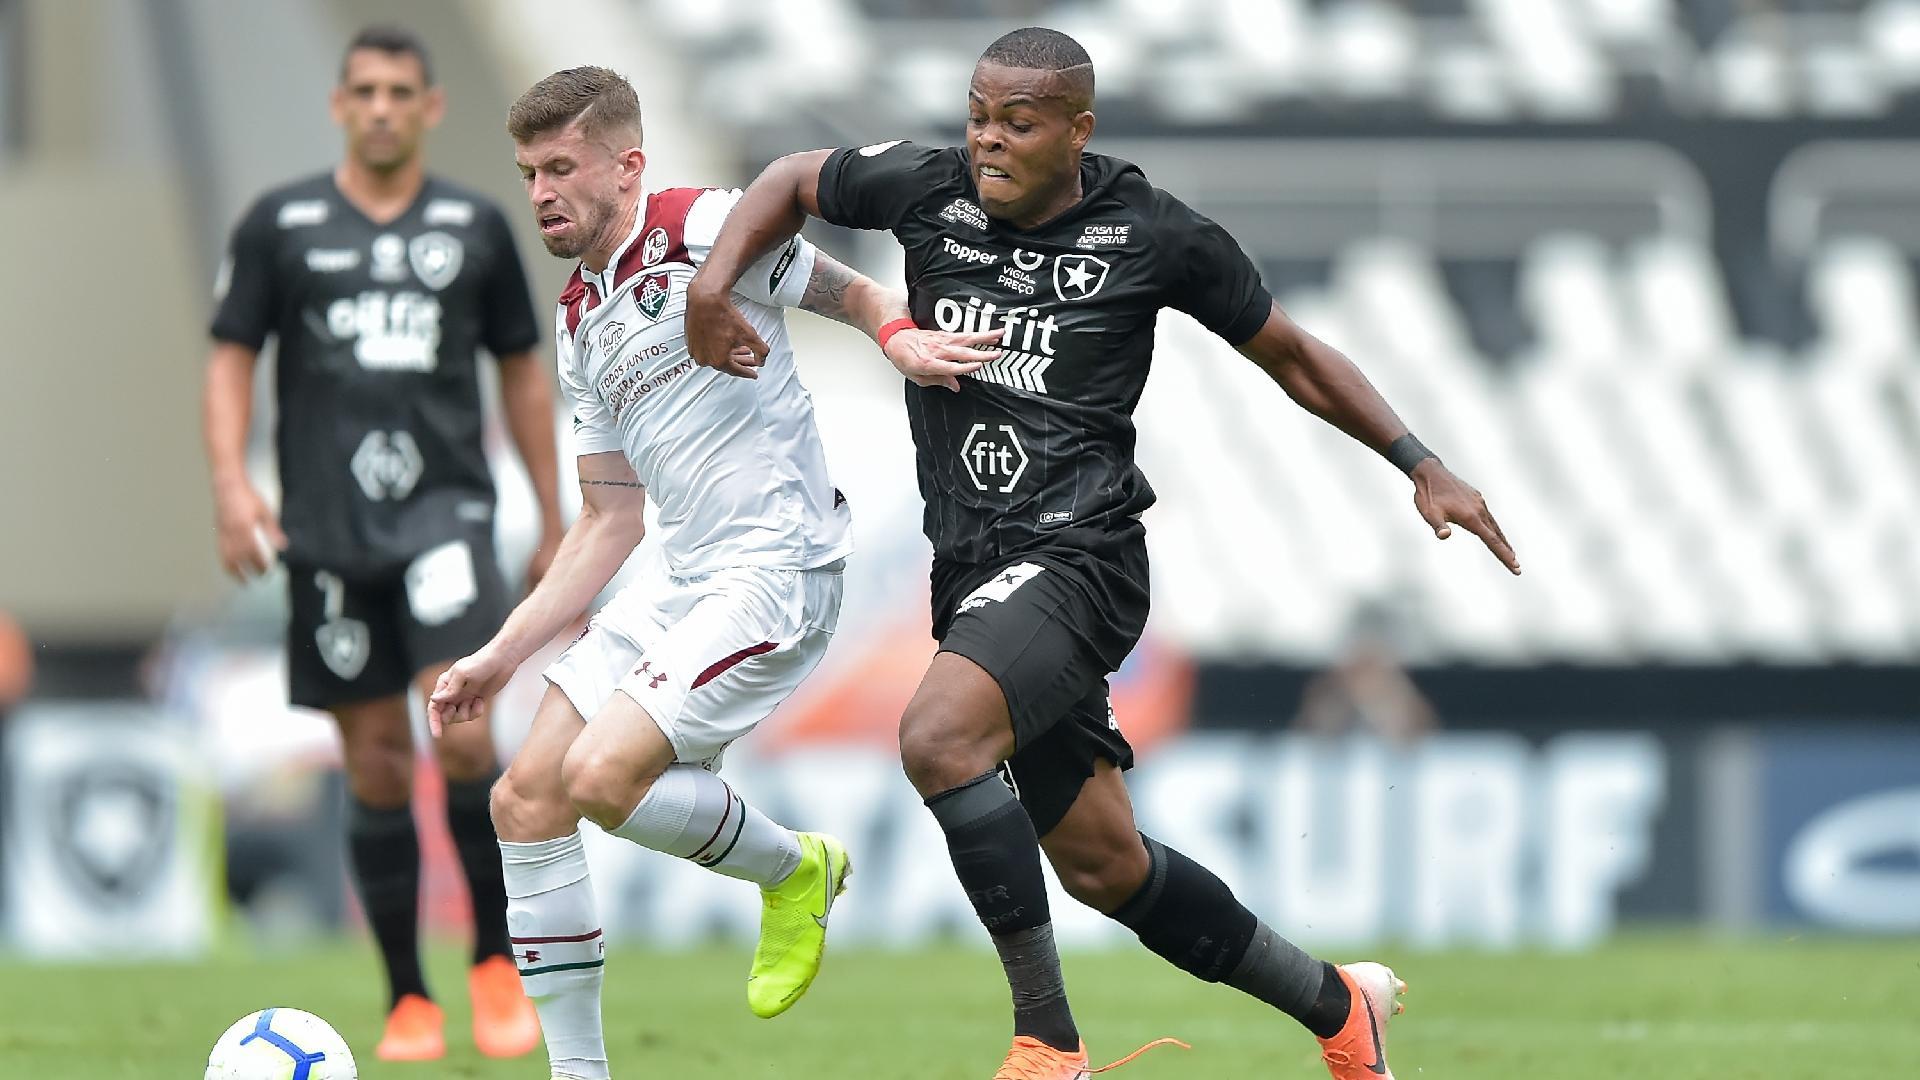 Jogadores disputam bola durante Botafogo x Fluminense